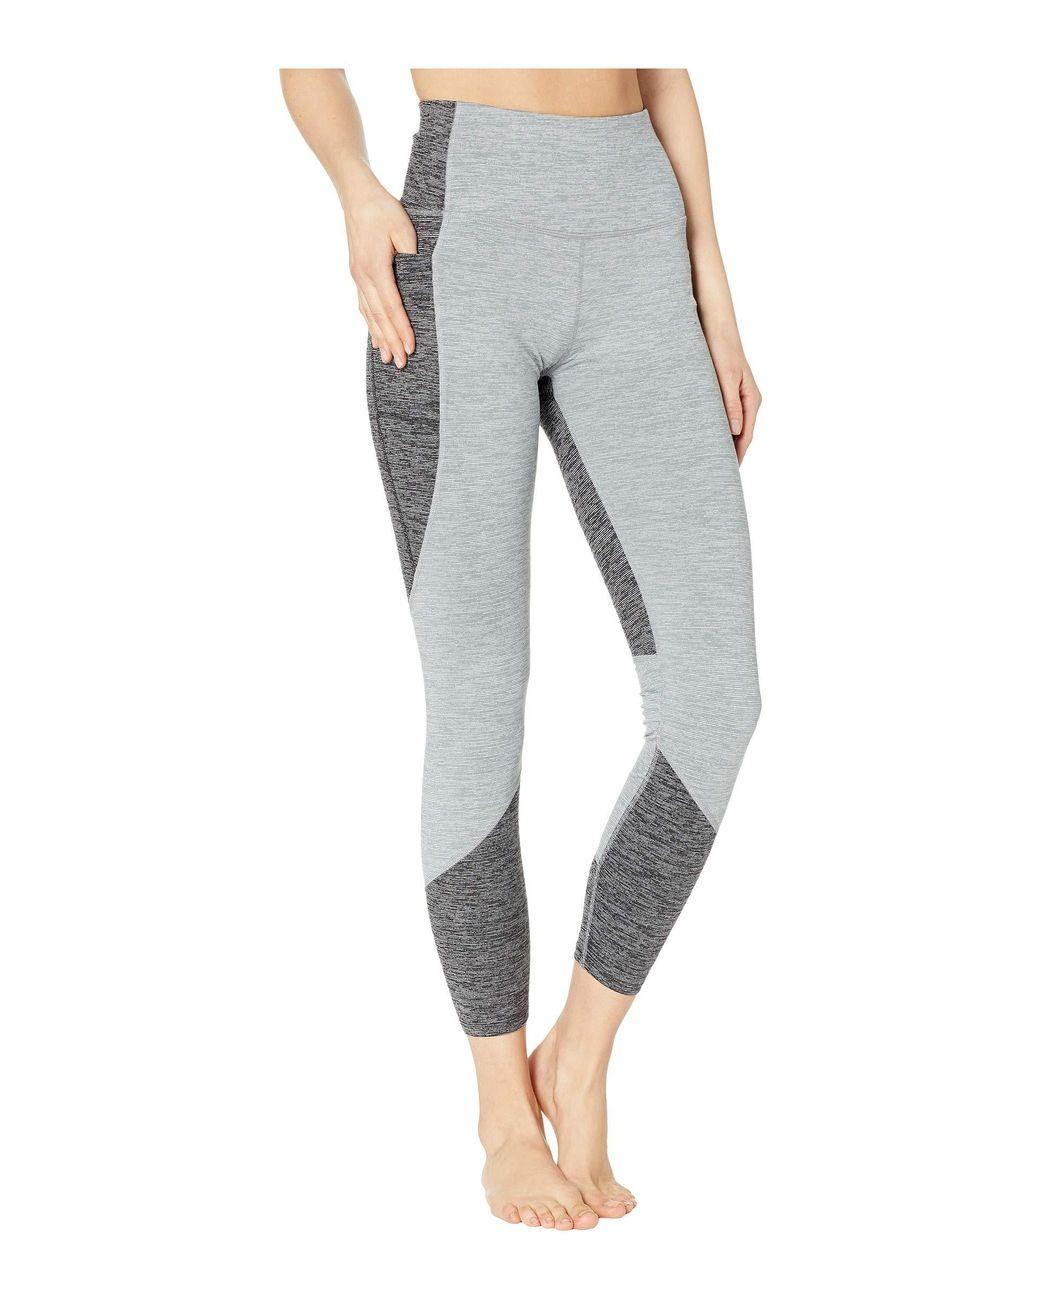 9388b98c9c40f Lyst - Skechers Empower Leggings (black/grey) Women's Casual Pants ...